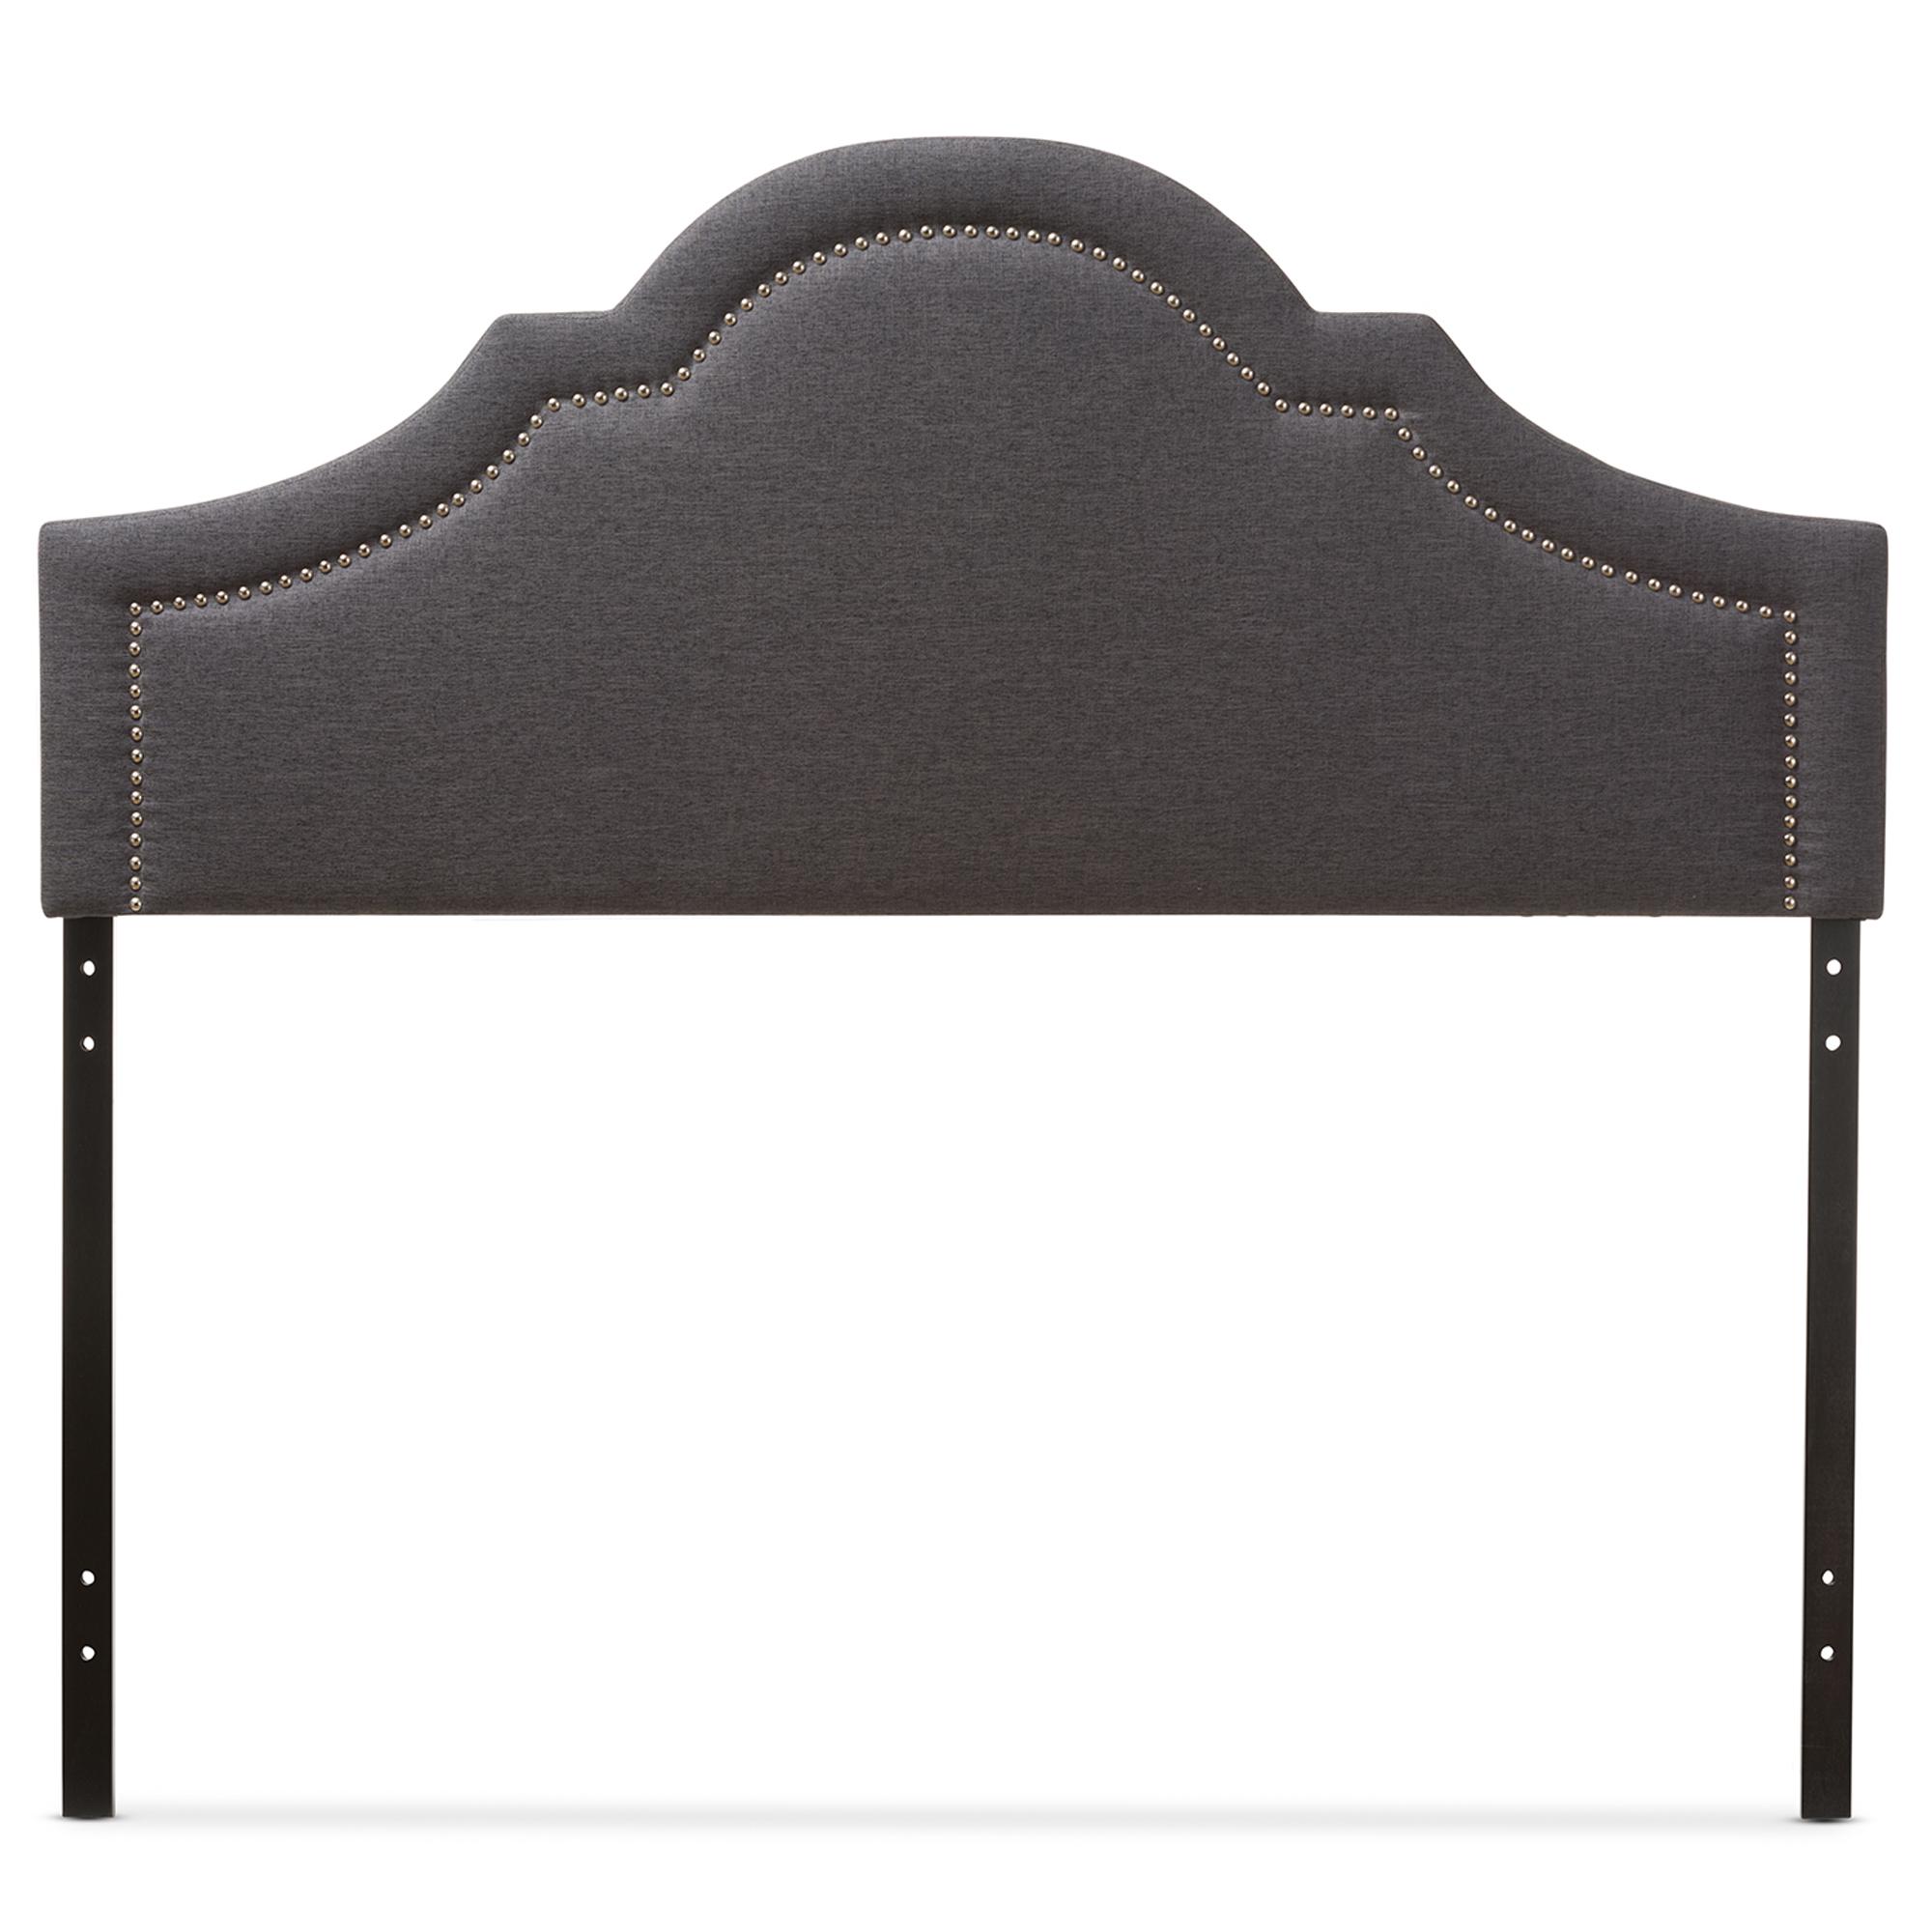 Baxton Studio Rita Modern and Contemporary Dark Grey Fabric Upholstered Queen Size Headboard